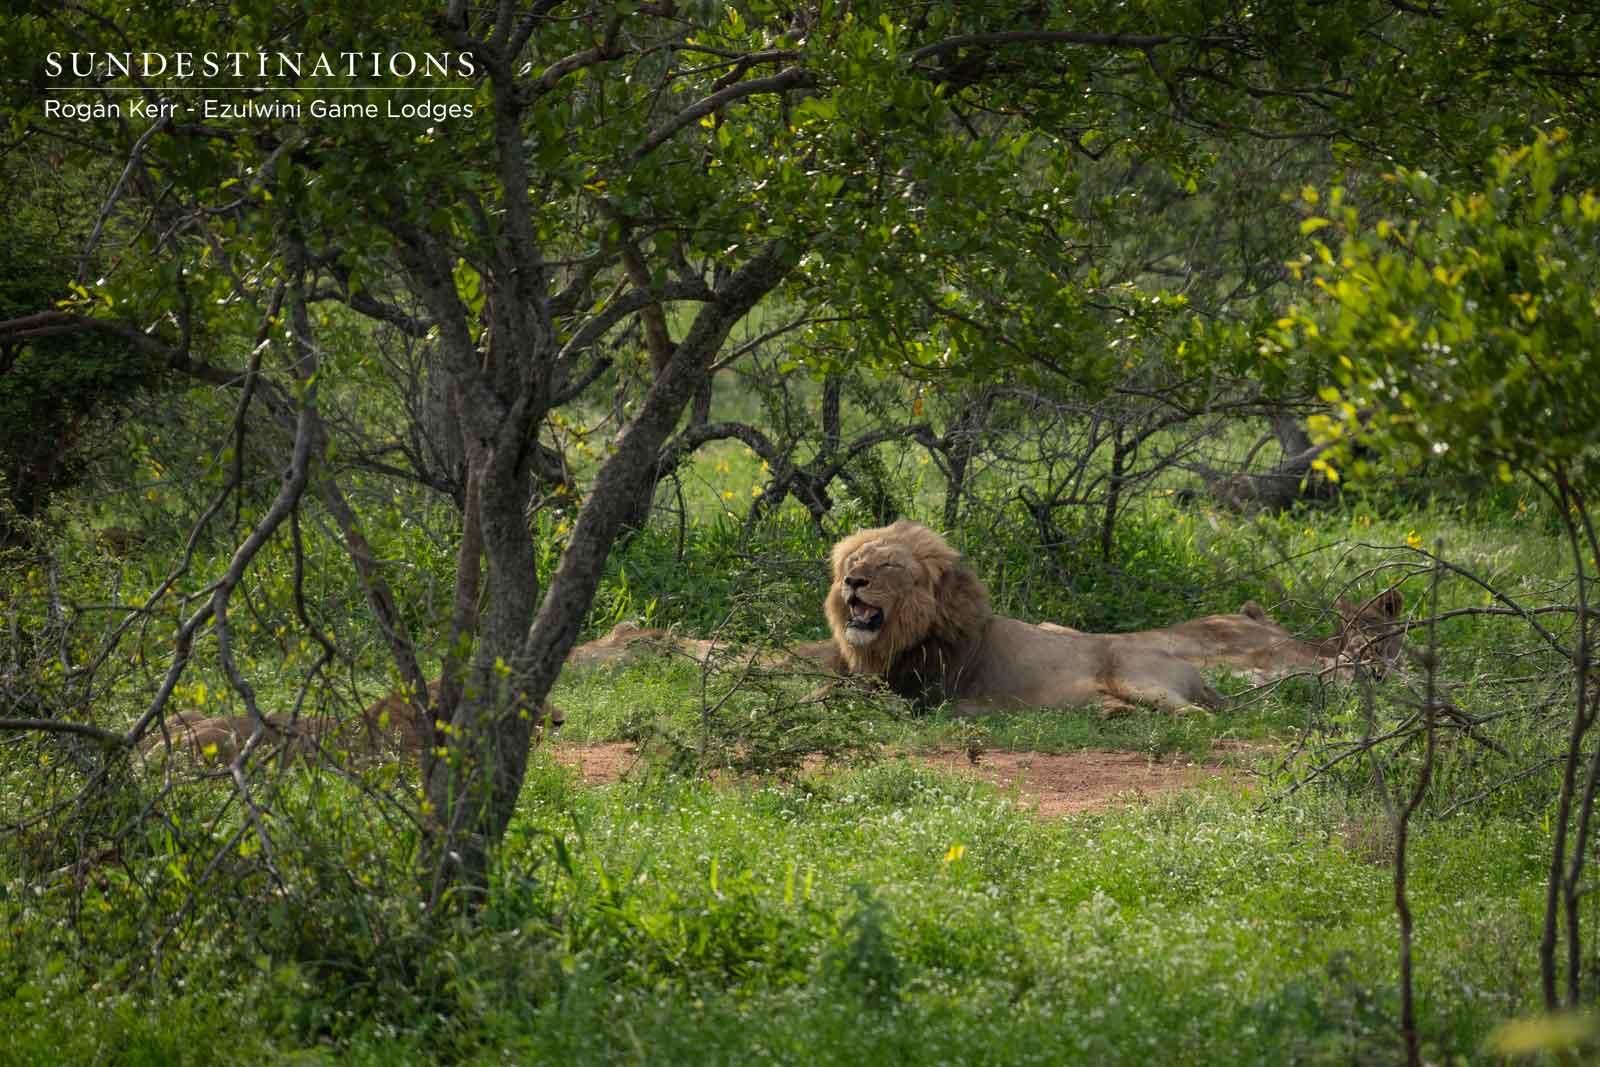 Machaton Male Lions - Ezulwini